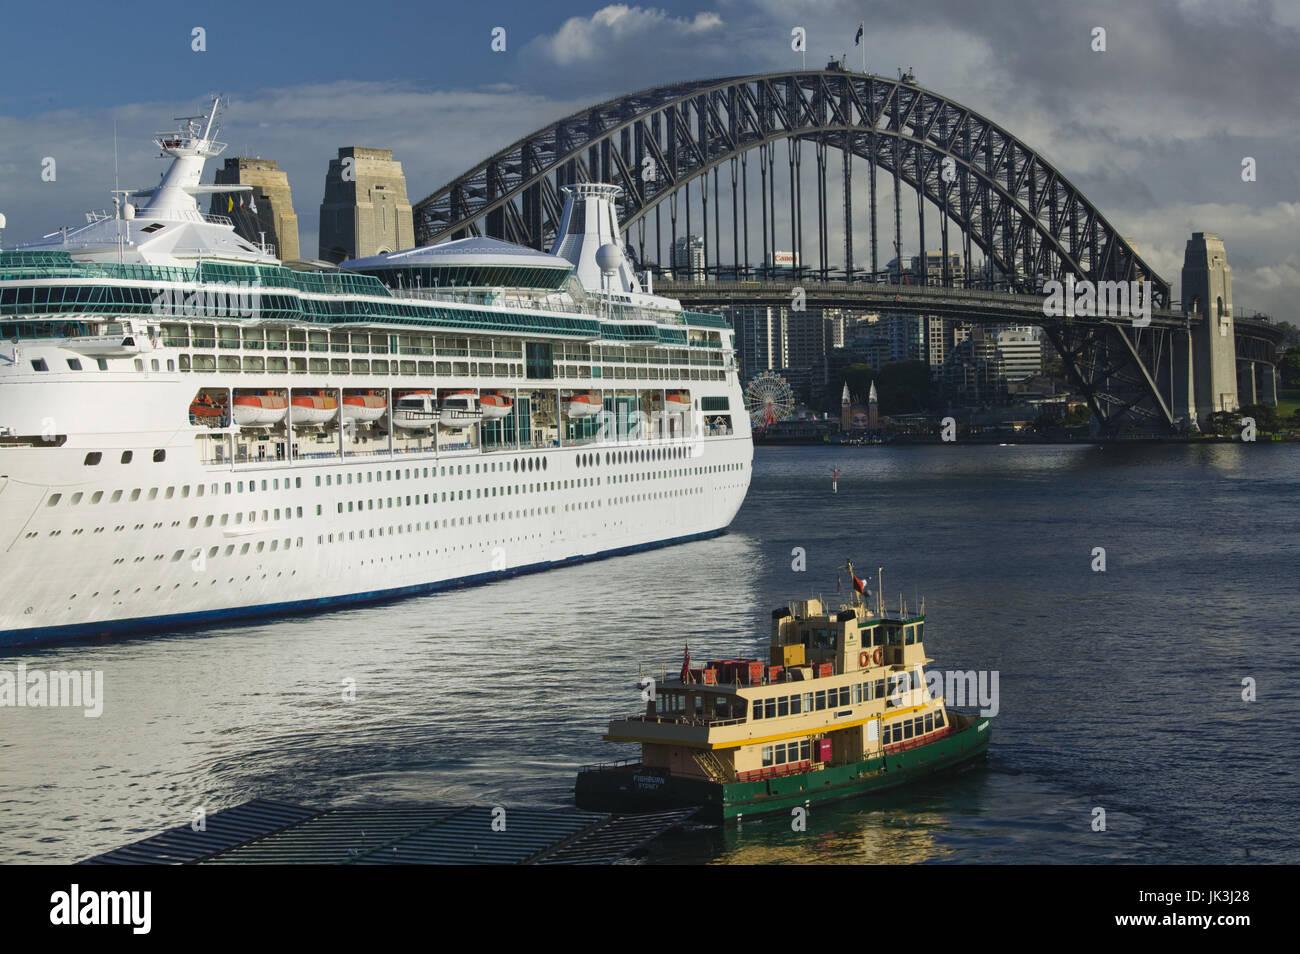 Australia, New South Wales, Sydney, Royal Caribbean Lines